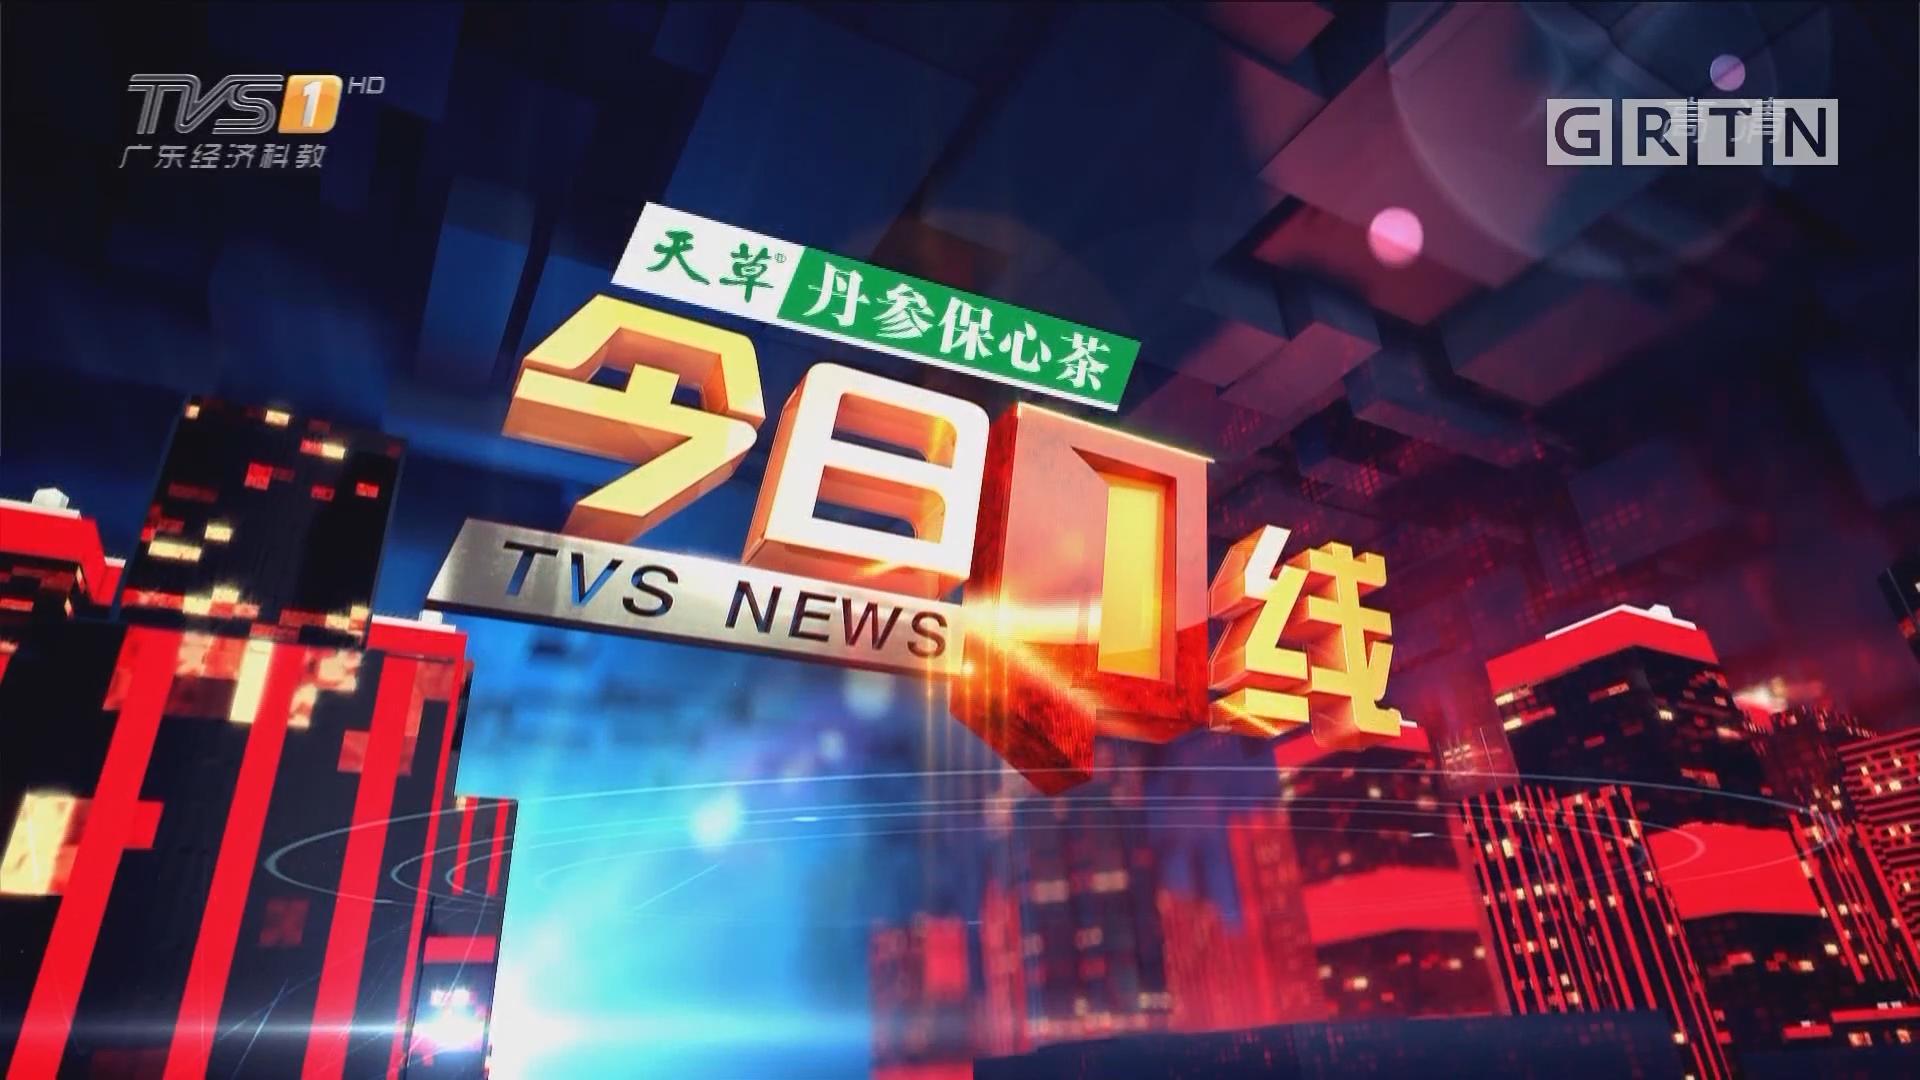 [HD][2019-04-06]今日一线:广州海珠区:旧旅店装修中起火 刑警介入调查